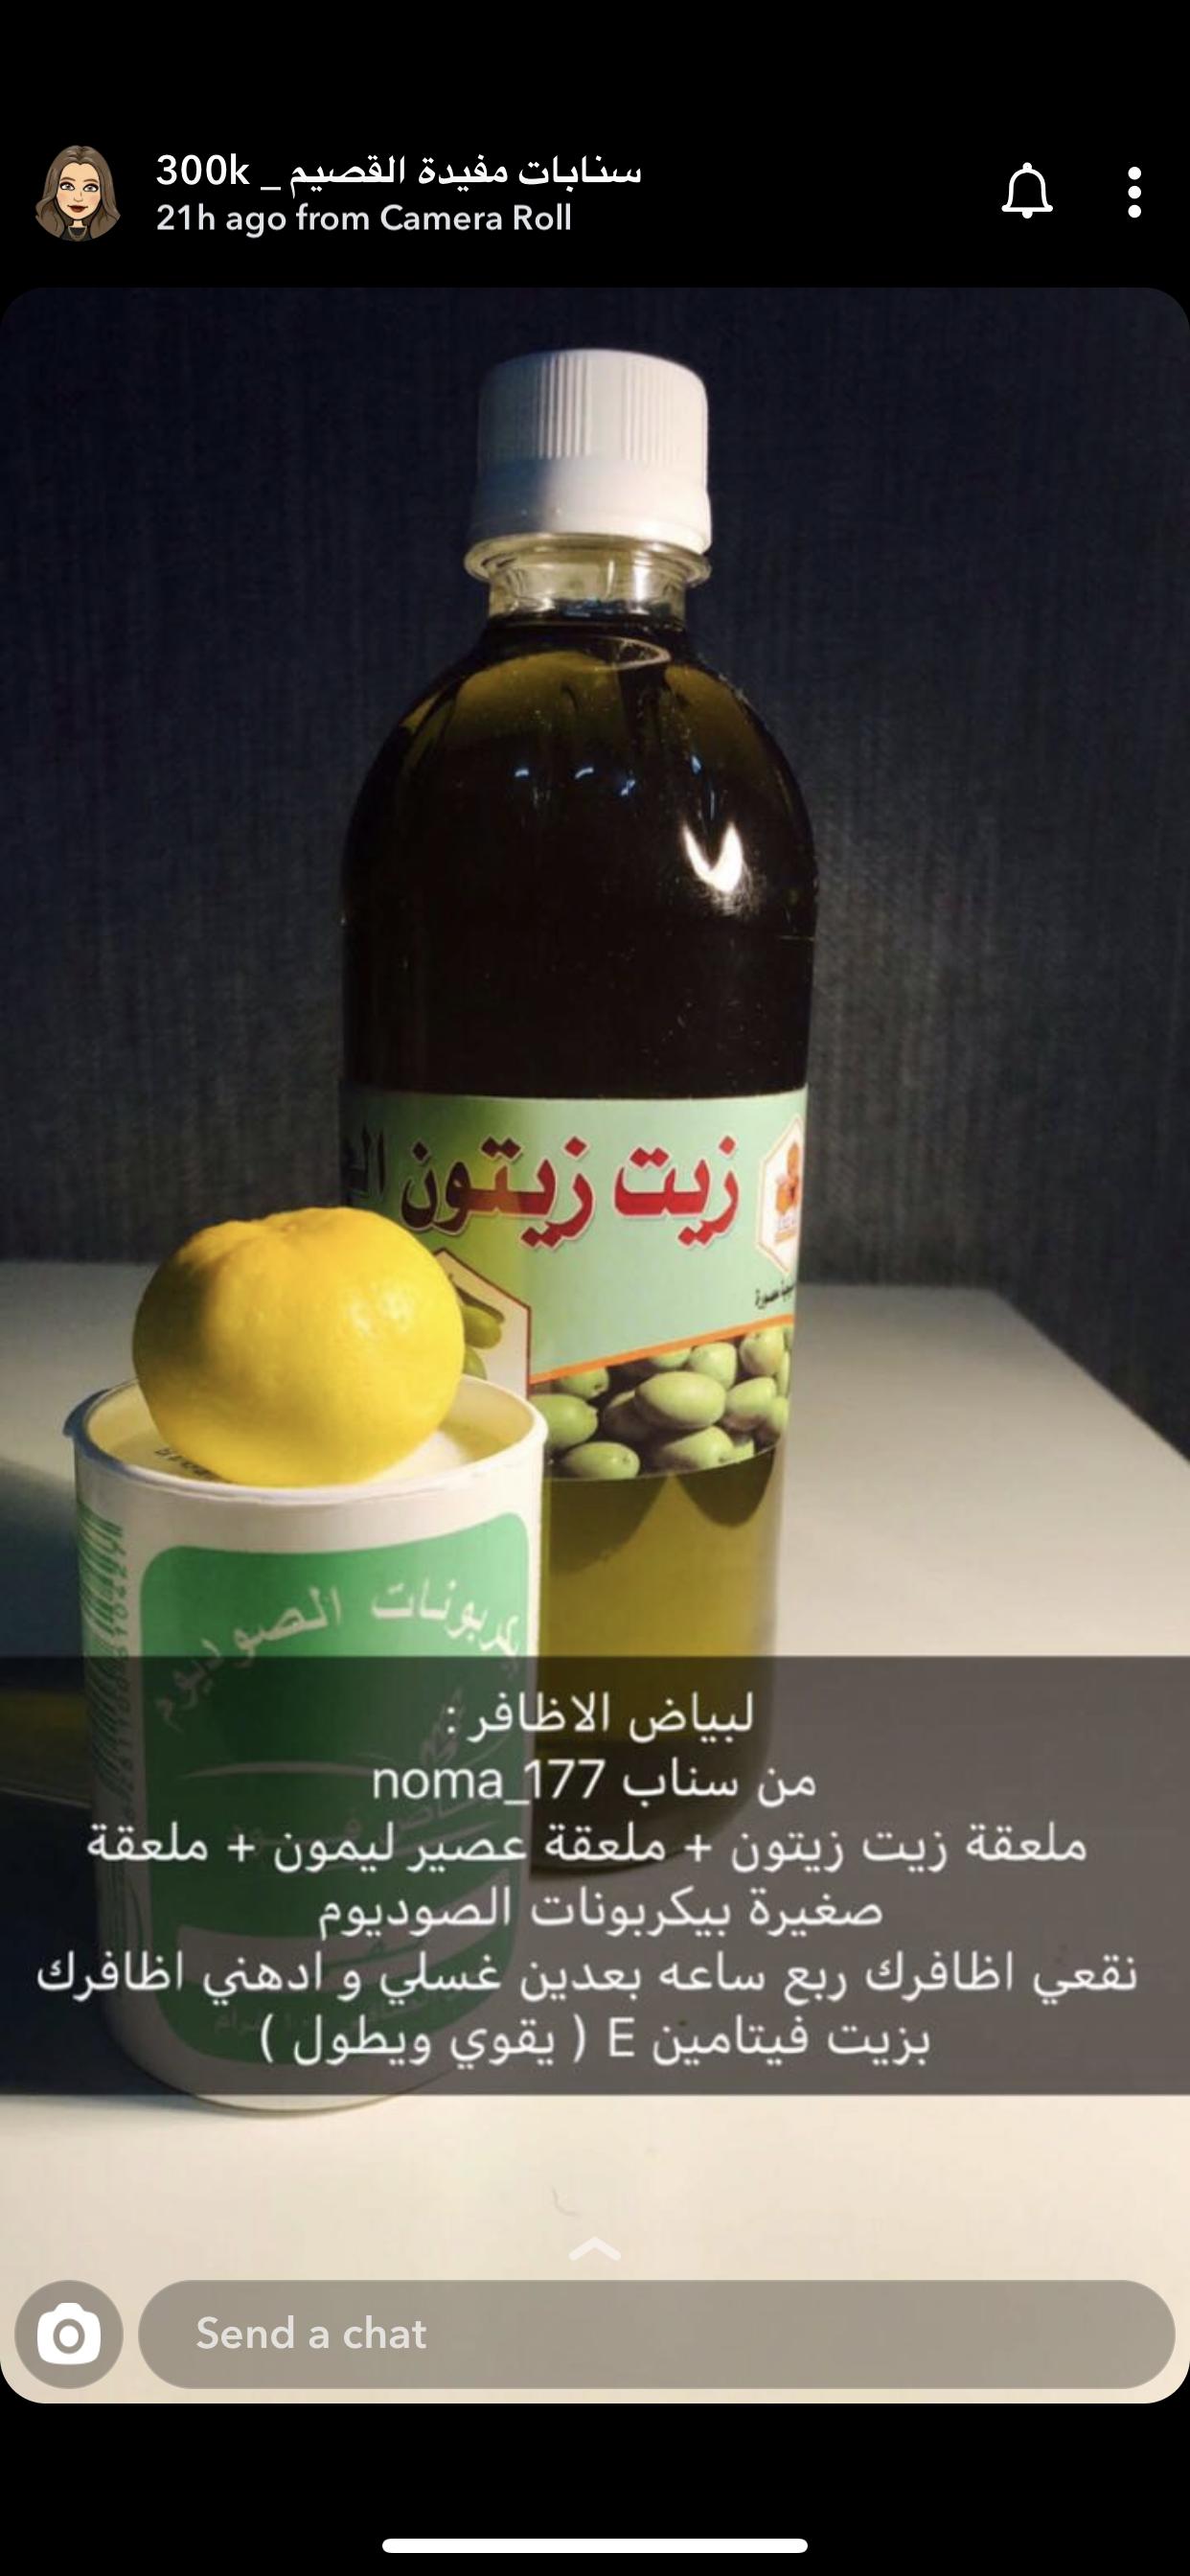 Pin By Maryam Alali On الجمال In 2020 Soap Bottle Hand Soap Bottle Hand Soap